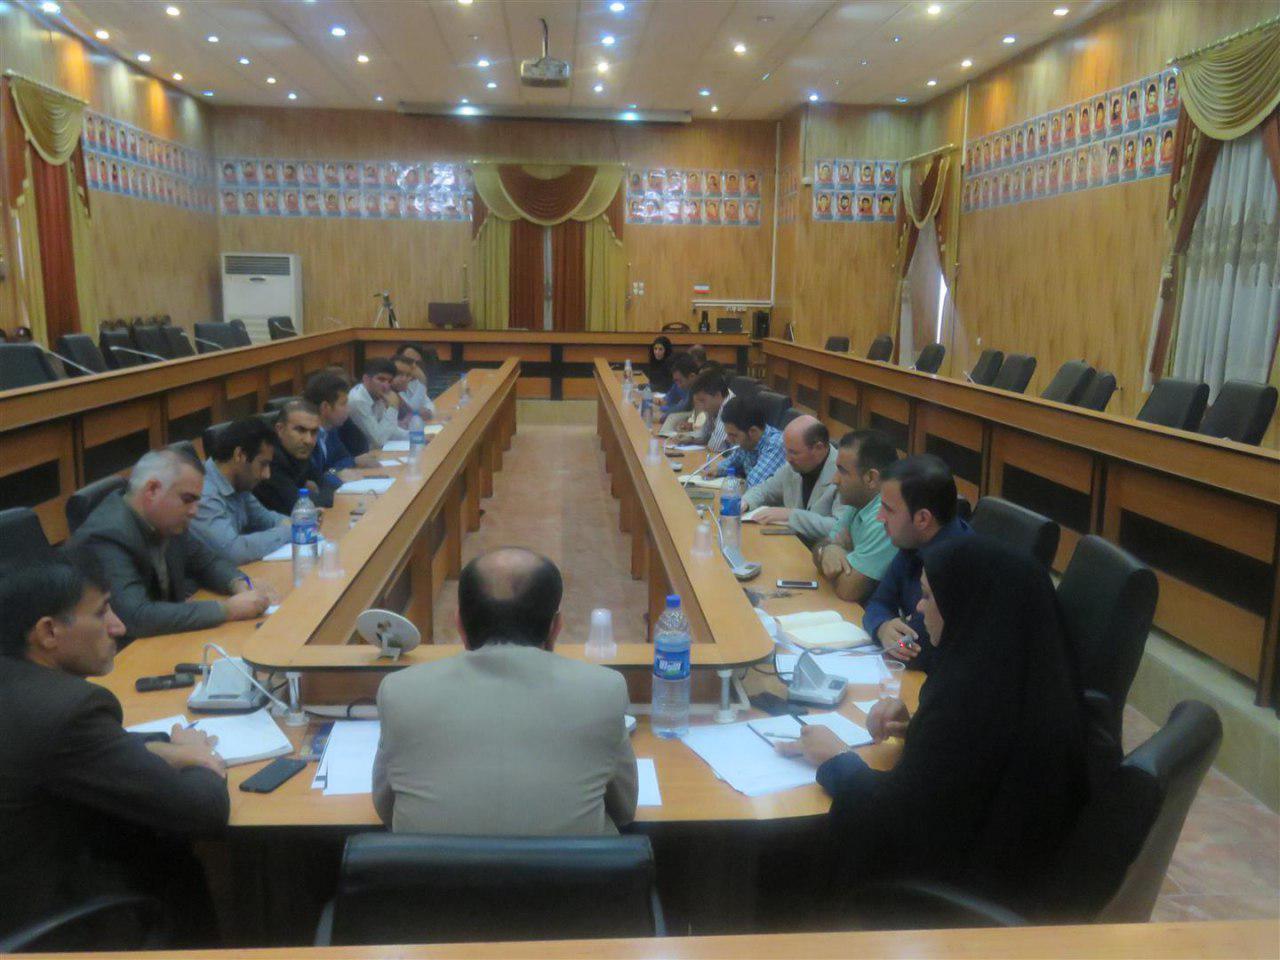 photo_2017-11-05_00-36-01 اعطای تسهیلات 4 درصد در قالب مشاغل خانگی در شهرستان فراشبند